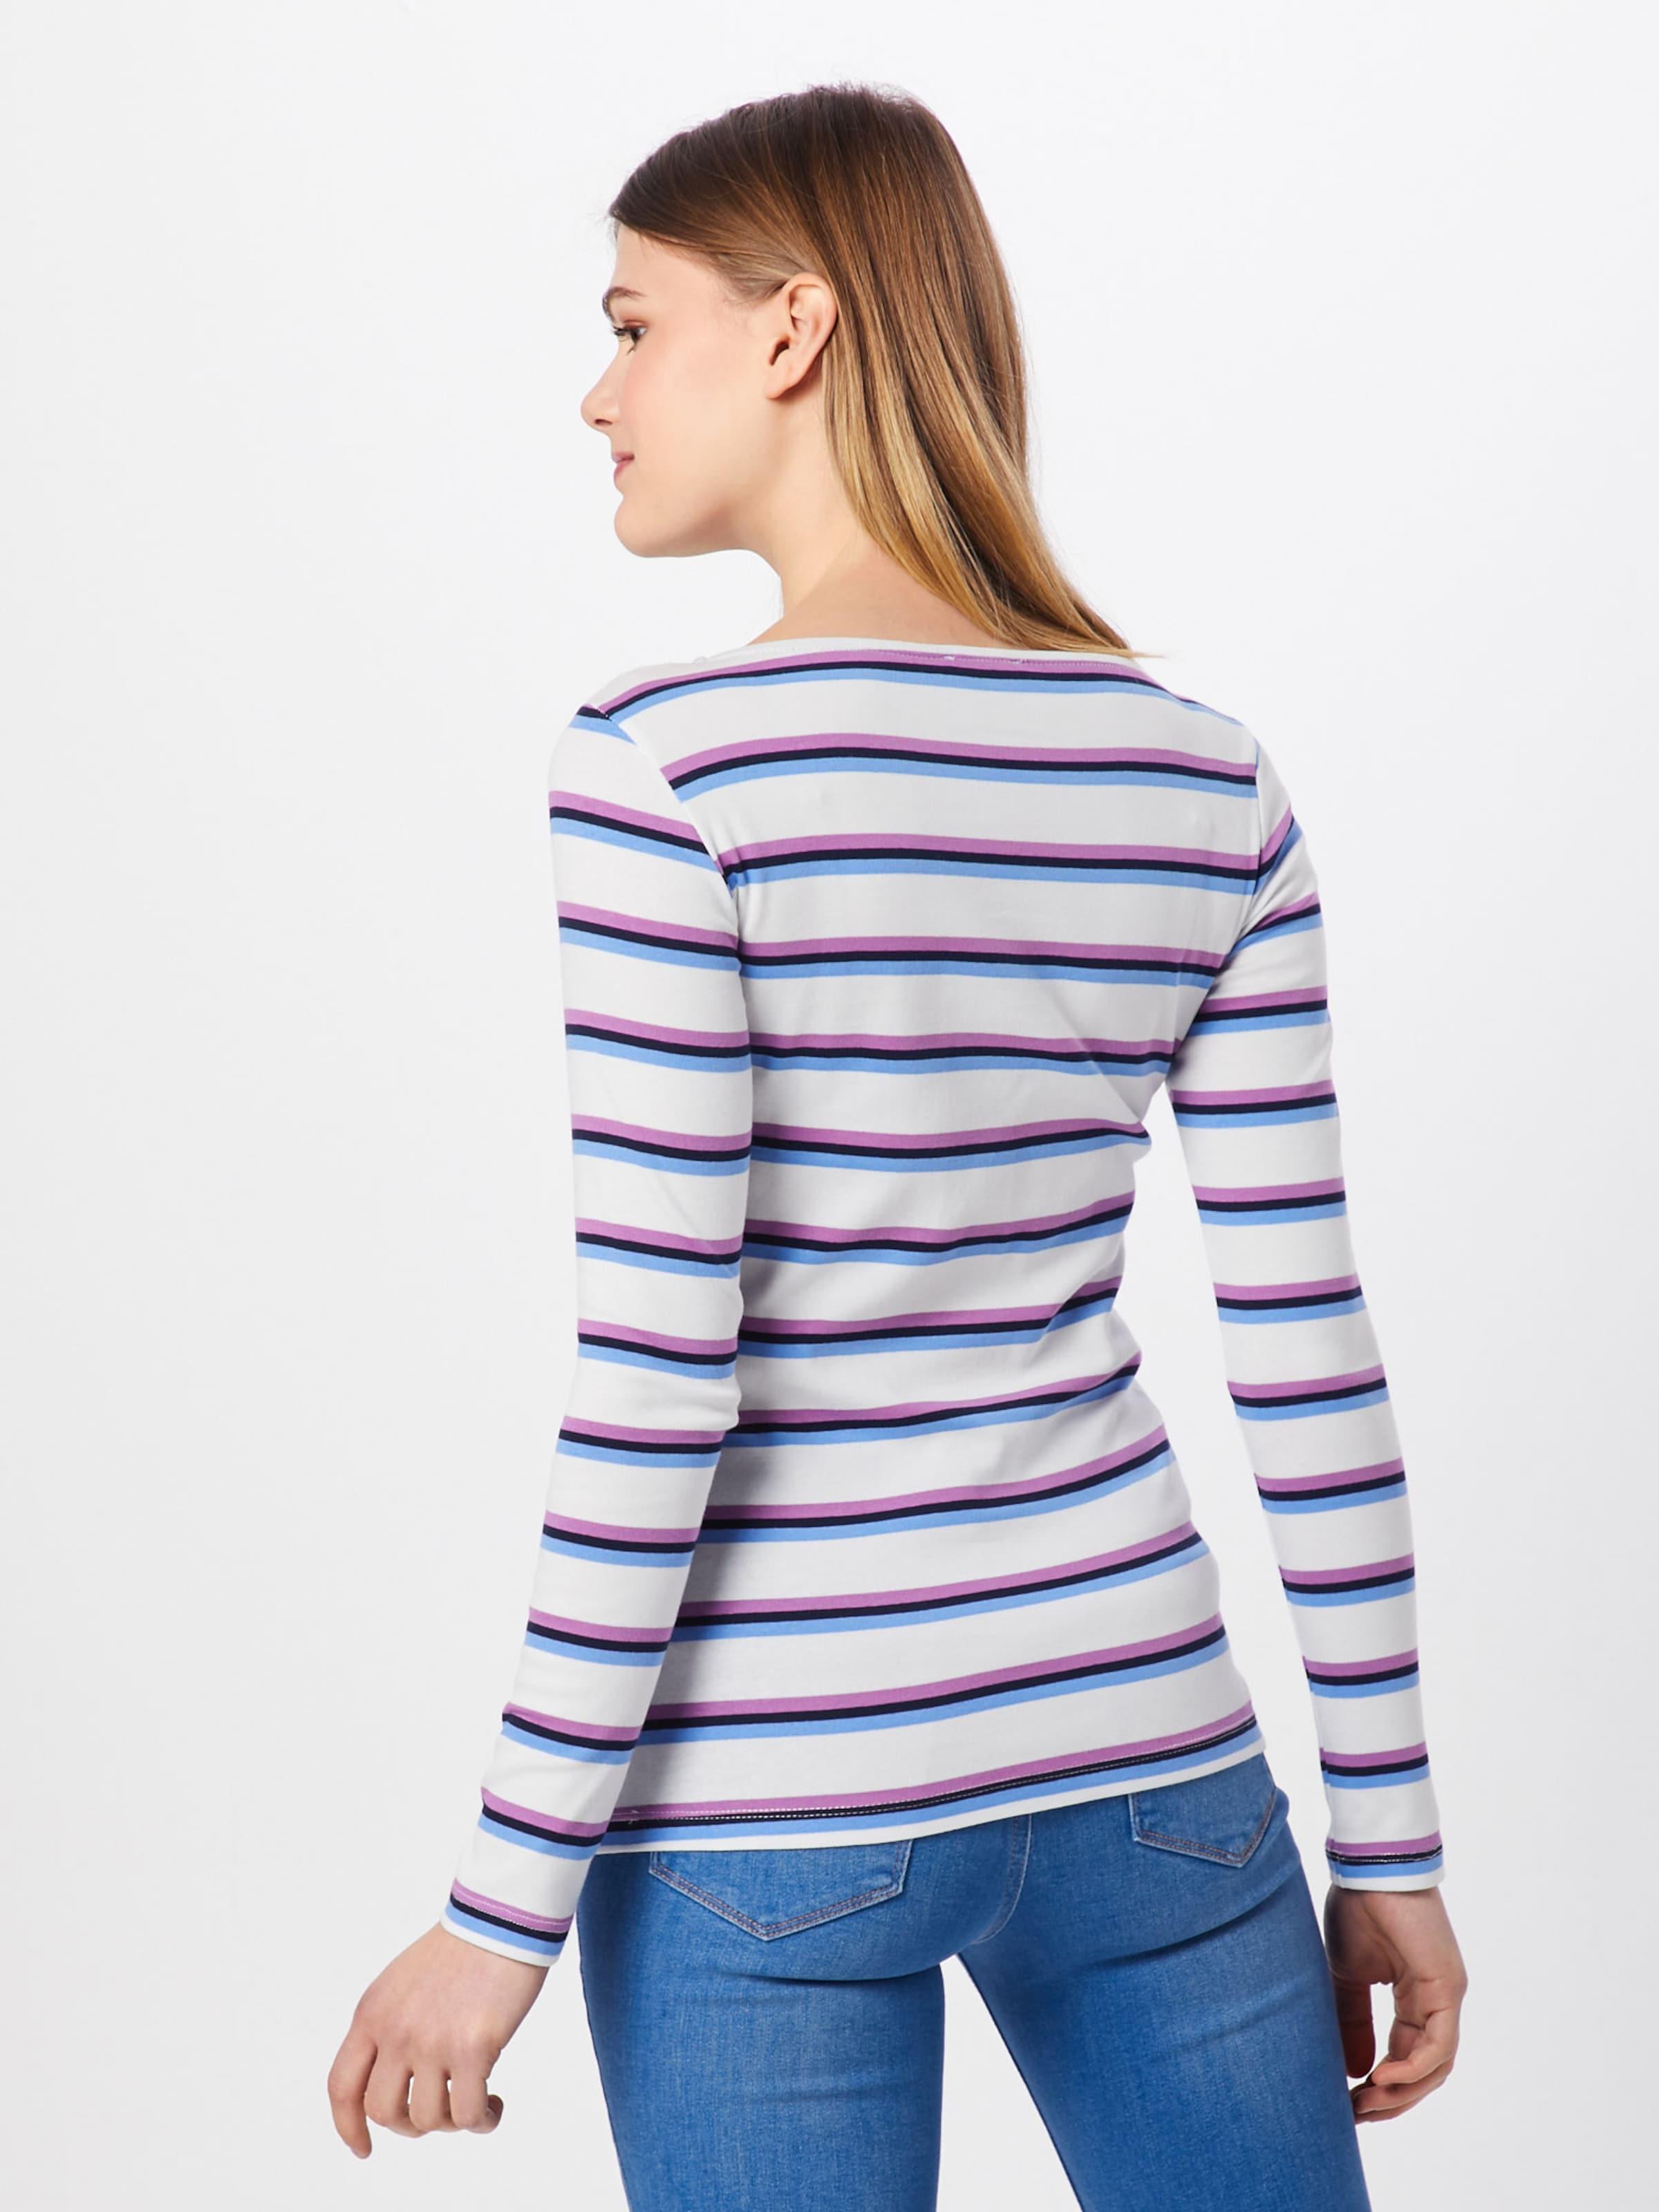 Shirt En Bleuviolet Clair T Tom Tailor H2e9id Blanc l1FT3KJc